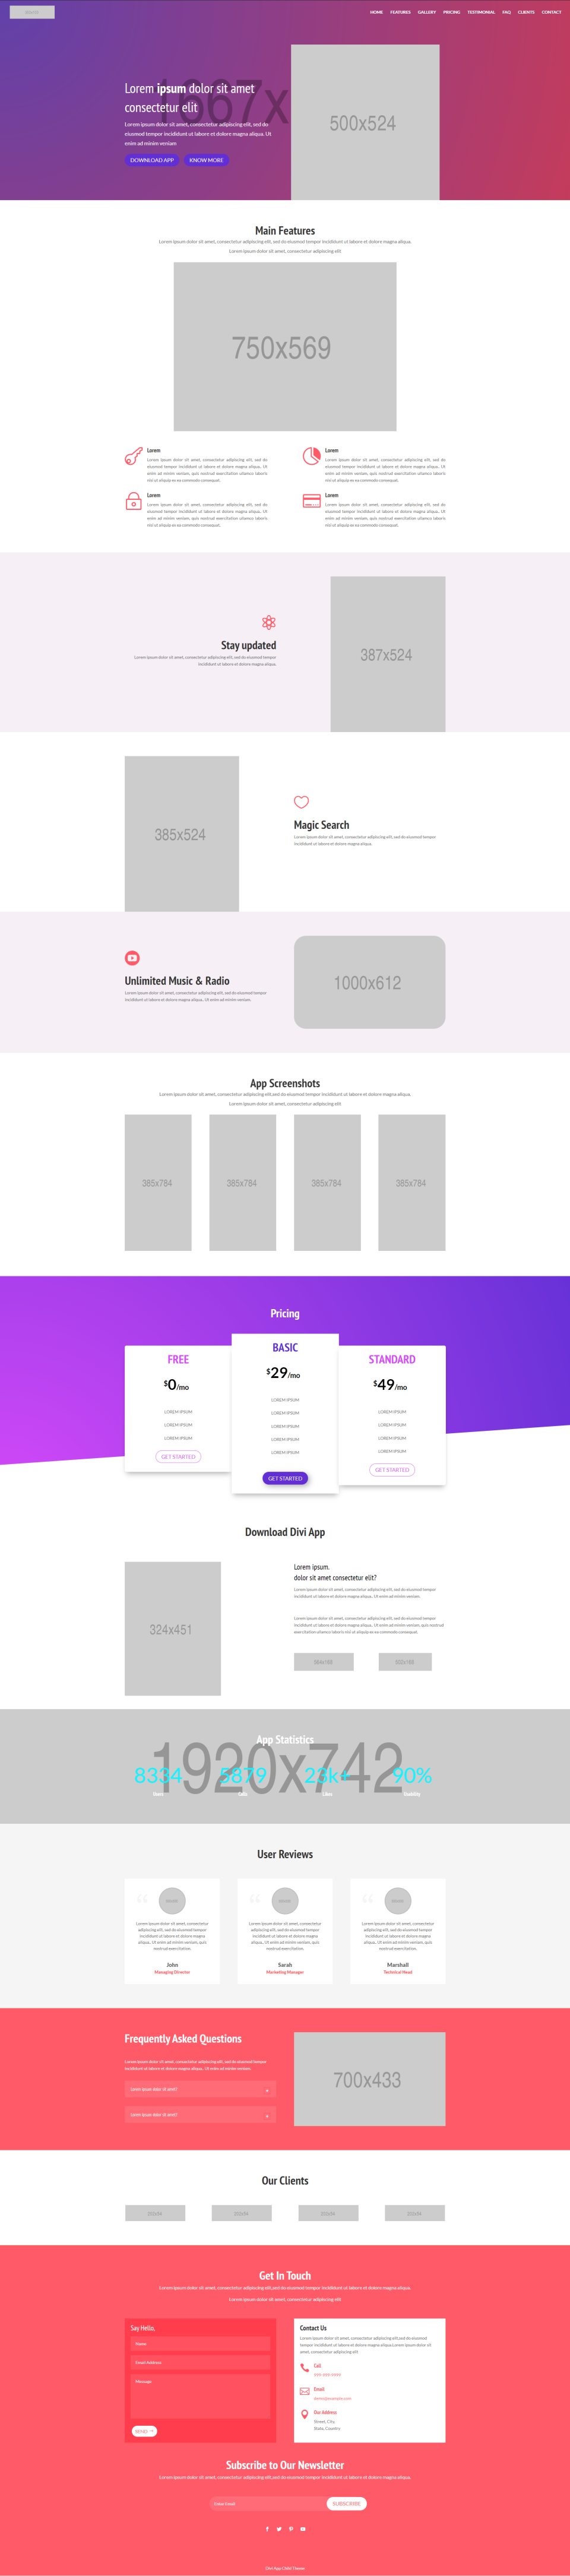 Divi App Child Theme Home Page